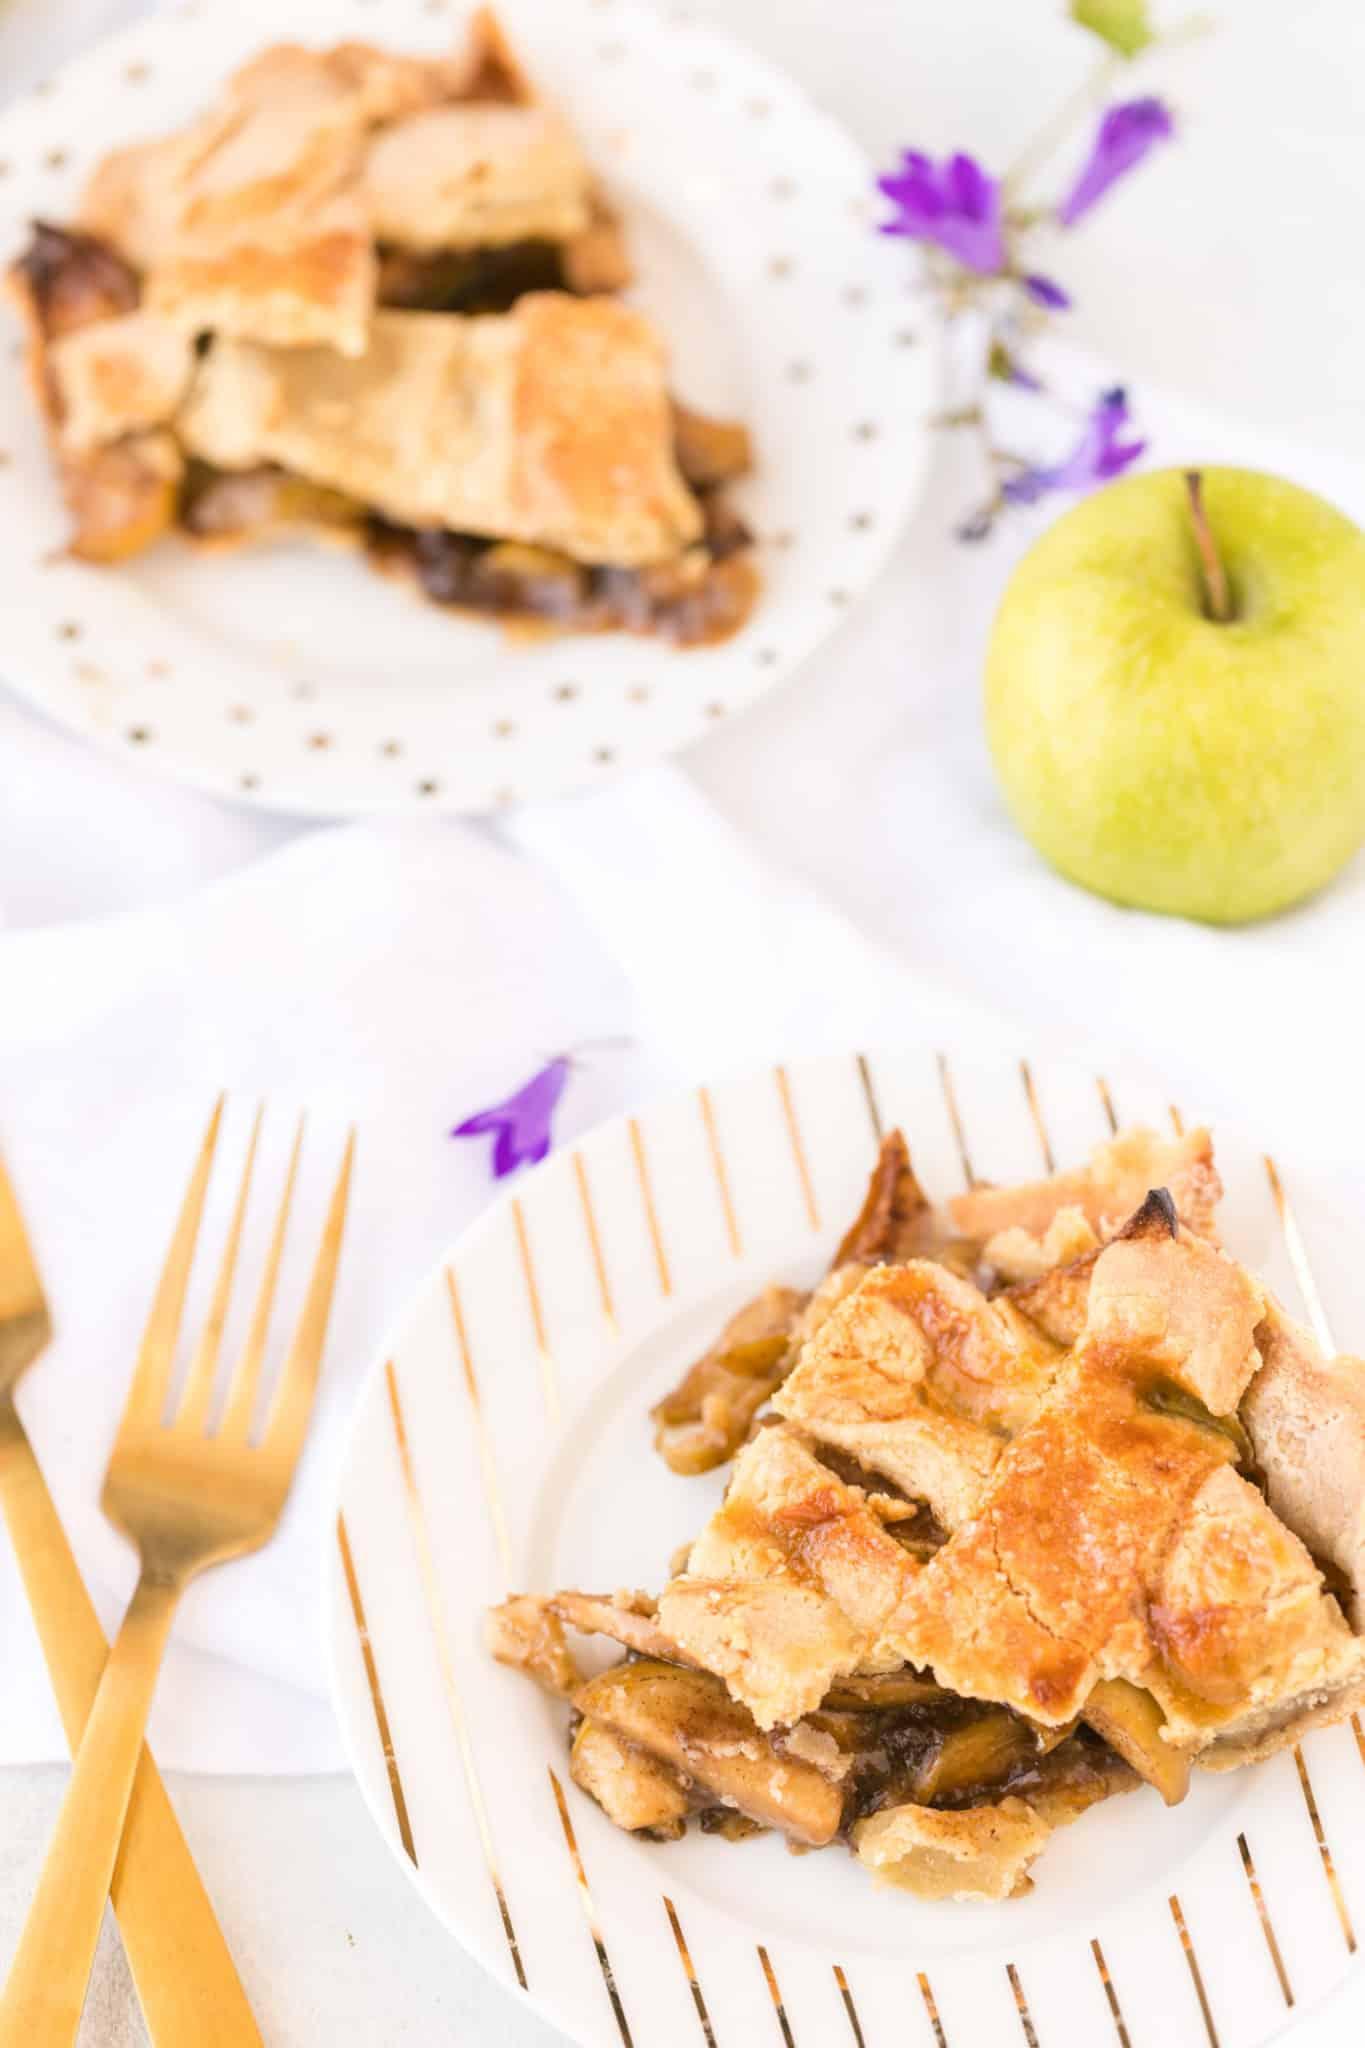 two slices of gluten-free apple pie